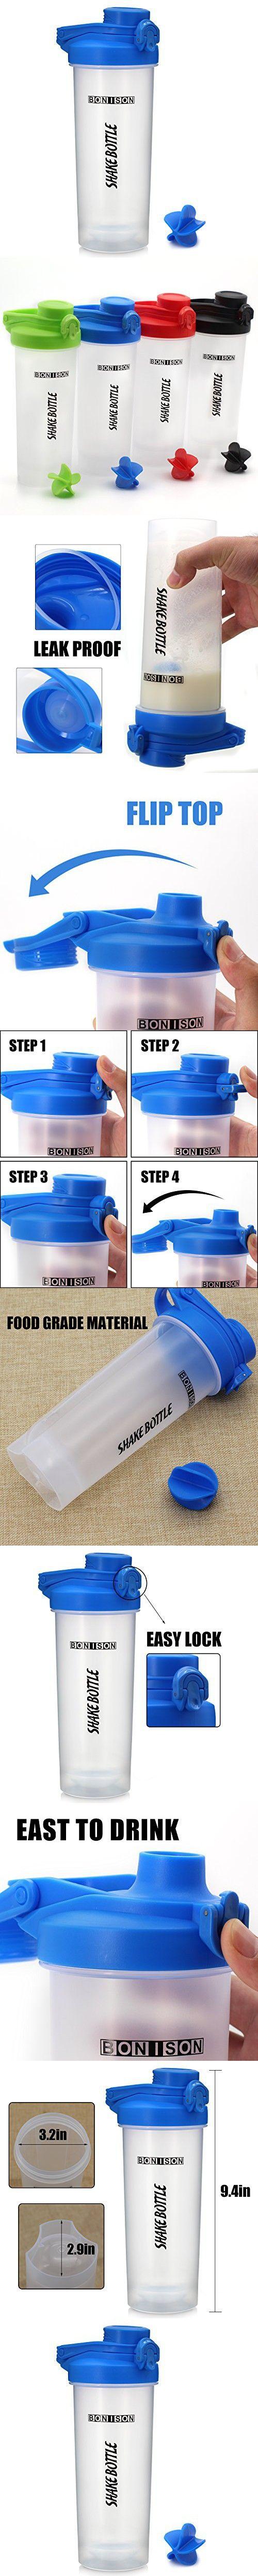 Hoople 24 OZ Mixers Protein Mixing Bottle Smoothies Shaker Mix Powders Shaker Bottle BPA and Phthalate-free Plastic Leak Proof Bottle Loop Top Twist Cap Shaker (24oz-blue)